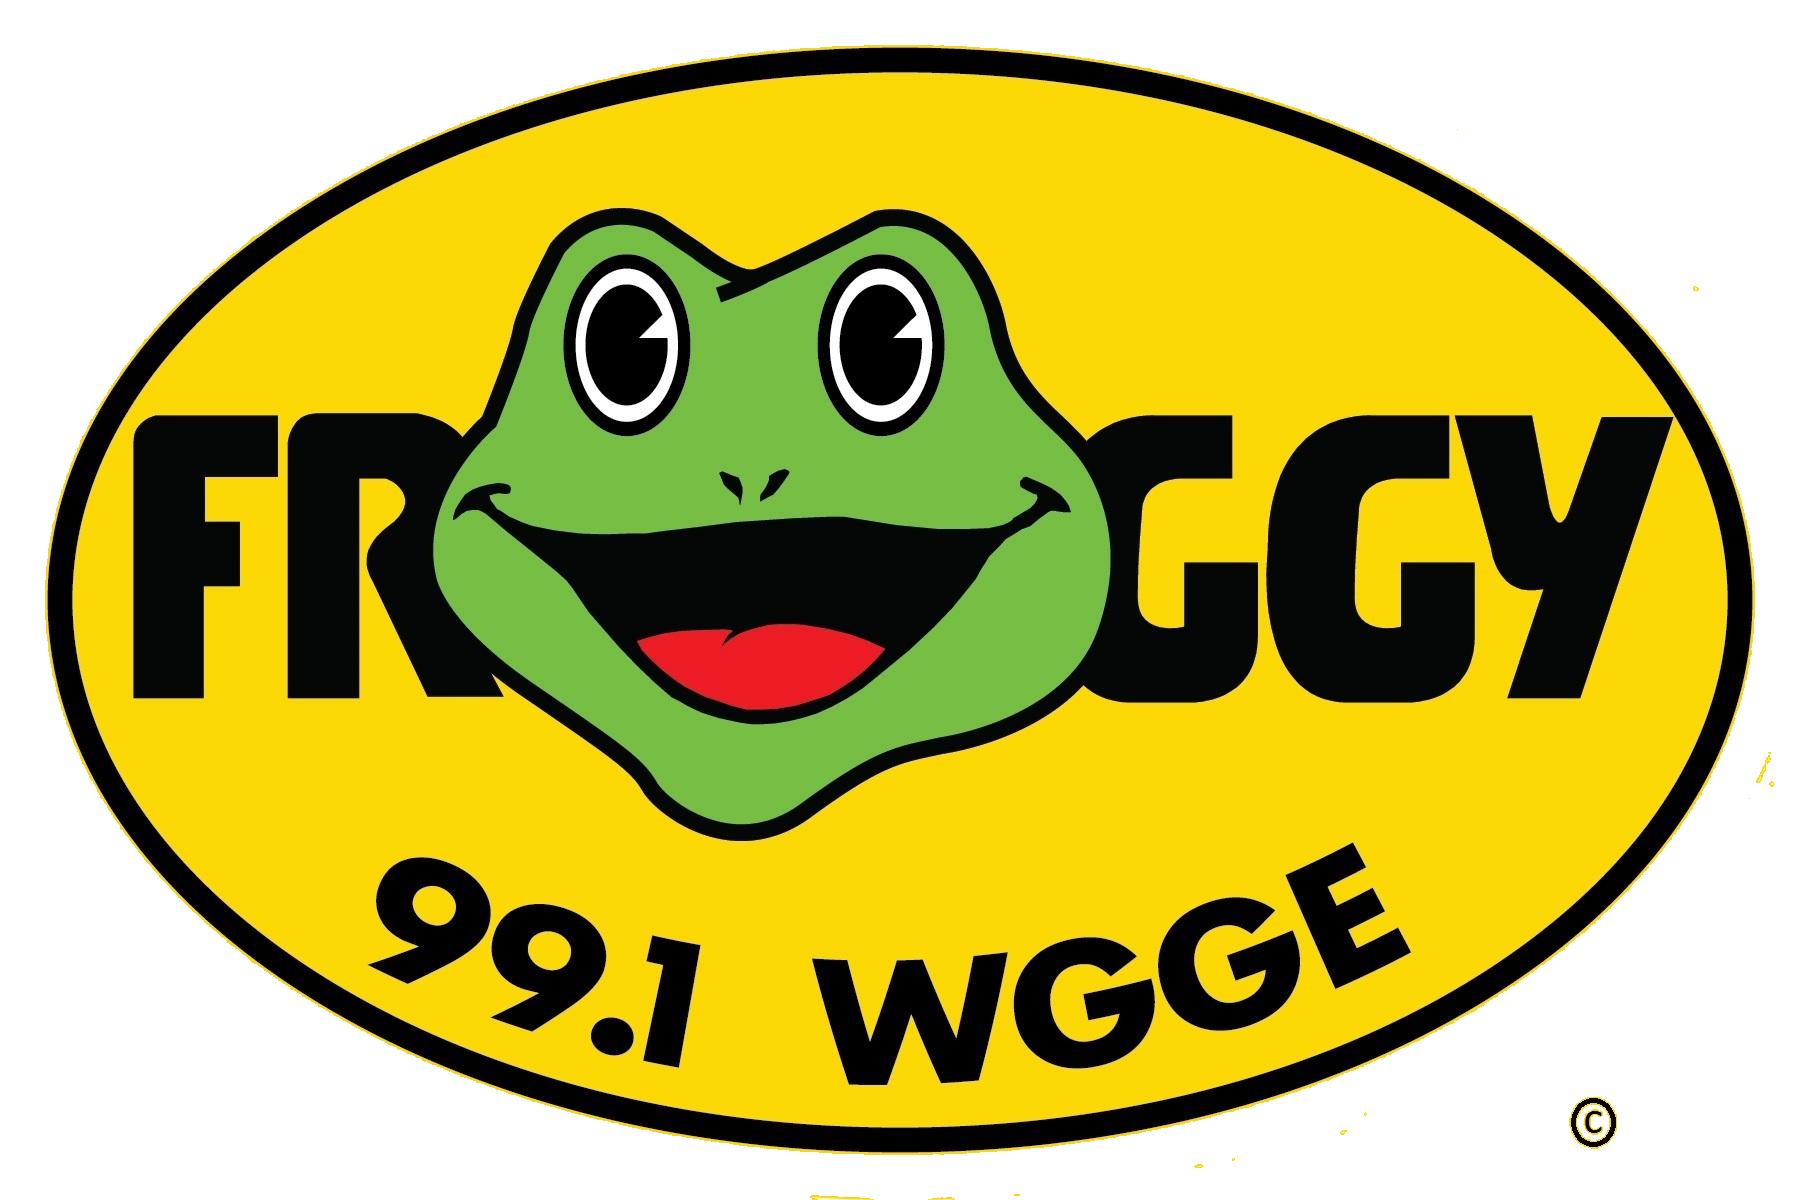 FROGGY 99 S